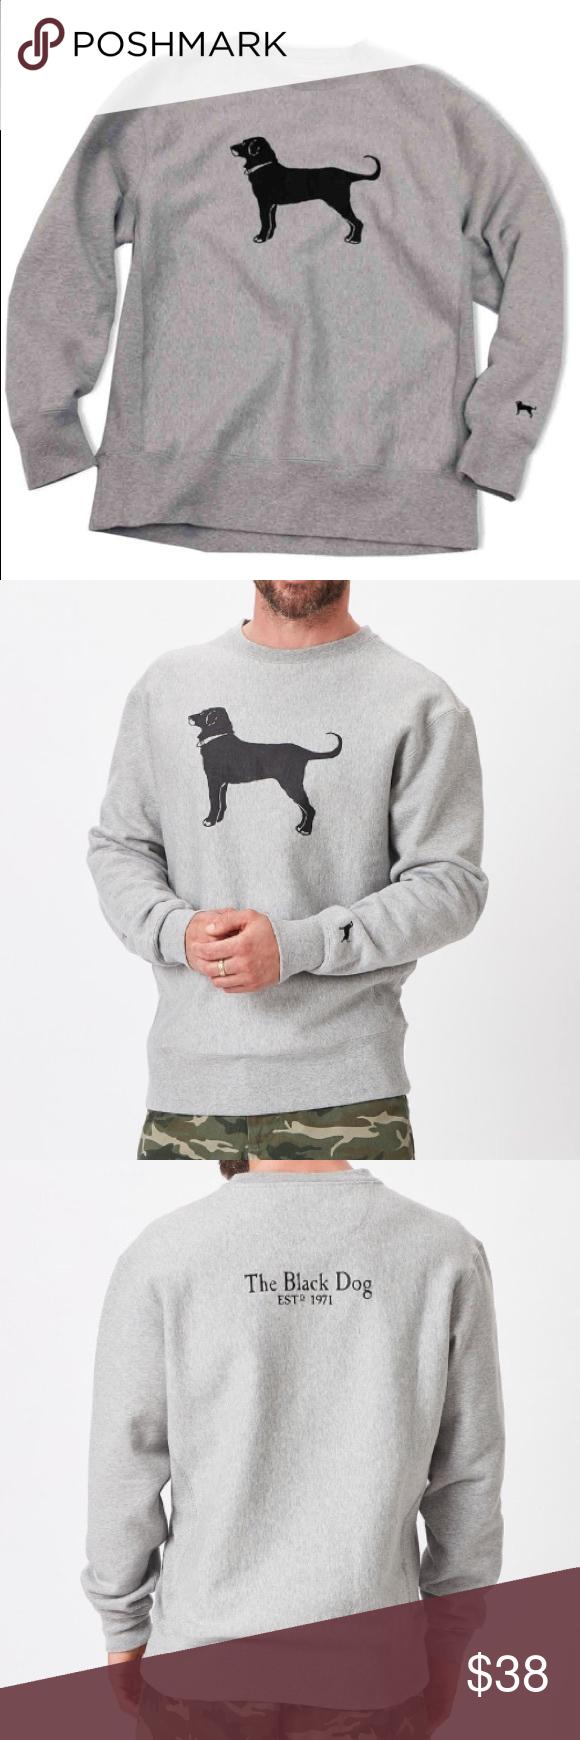 Black Dog Classic Heavyweight Crewneck Sweatshirt Sweatshirts Crew Neck Sweatshirt Black Dog [ 1740 x 580 Pixel ]